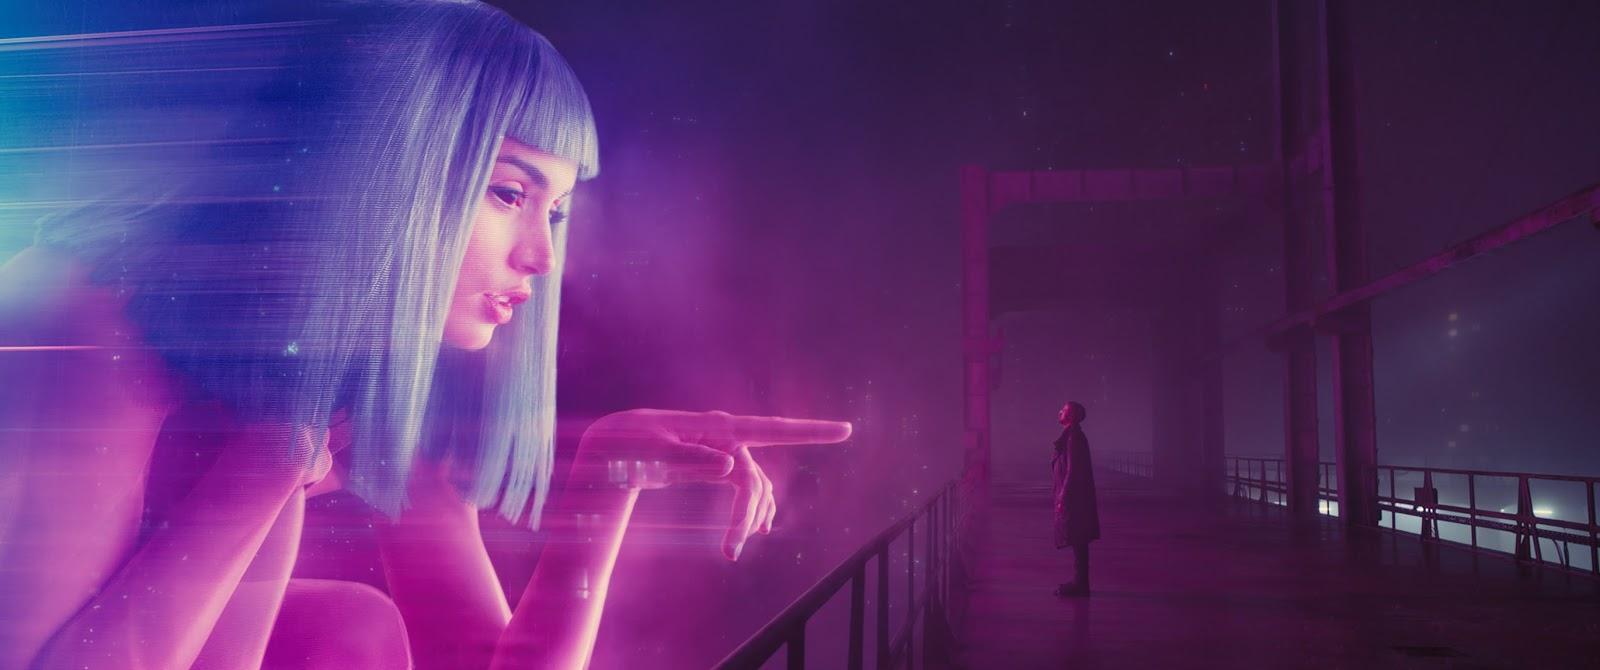 "&#39;Blade Runner 2049&#39;: El milagro de Villeneuve <fieldset class=""val-fieldset""><legend></legend><span class=""valoracion val-50""></span></fieldset>"